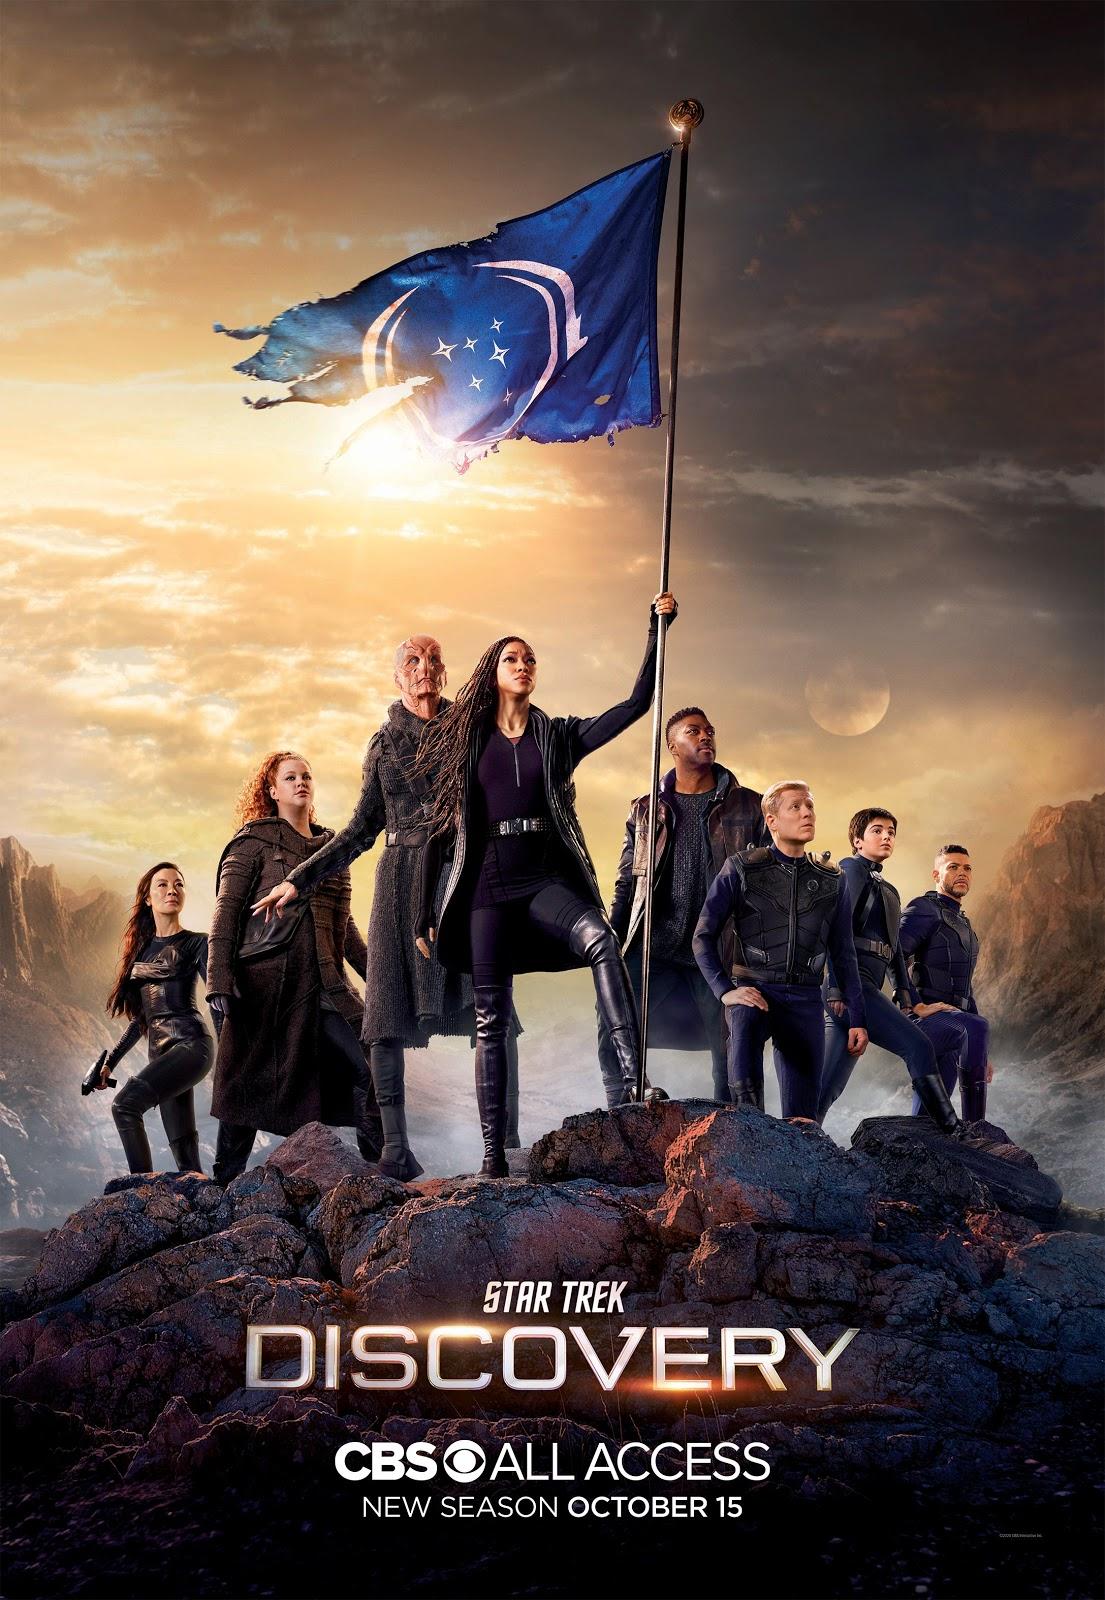 Star Trek Discovery season 3 key art